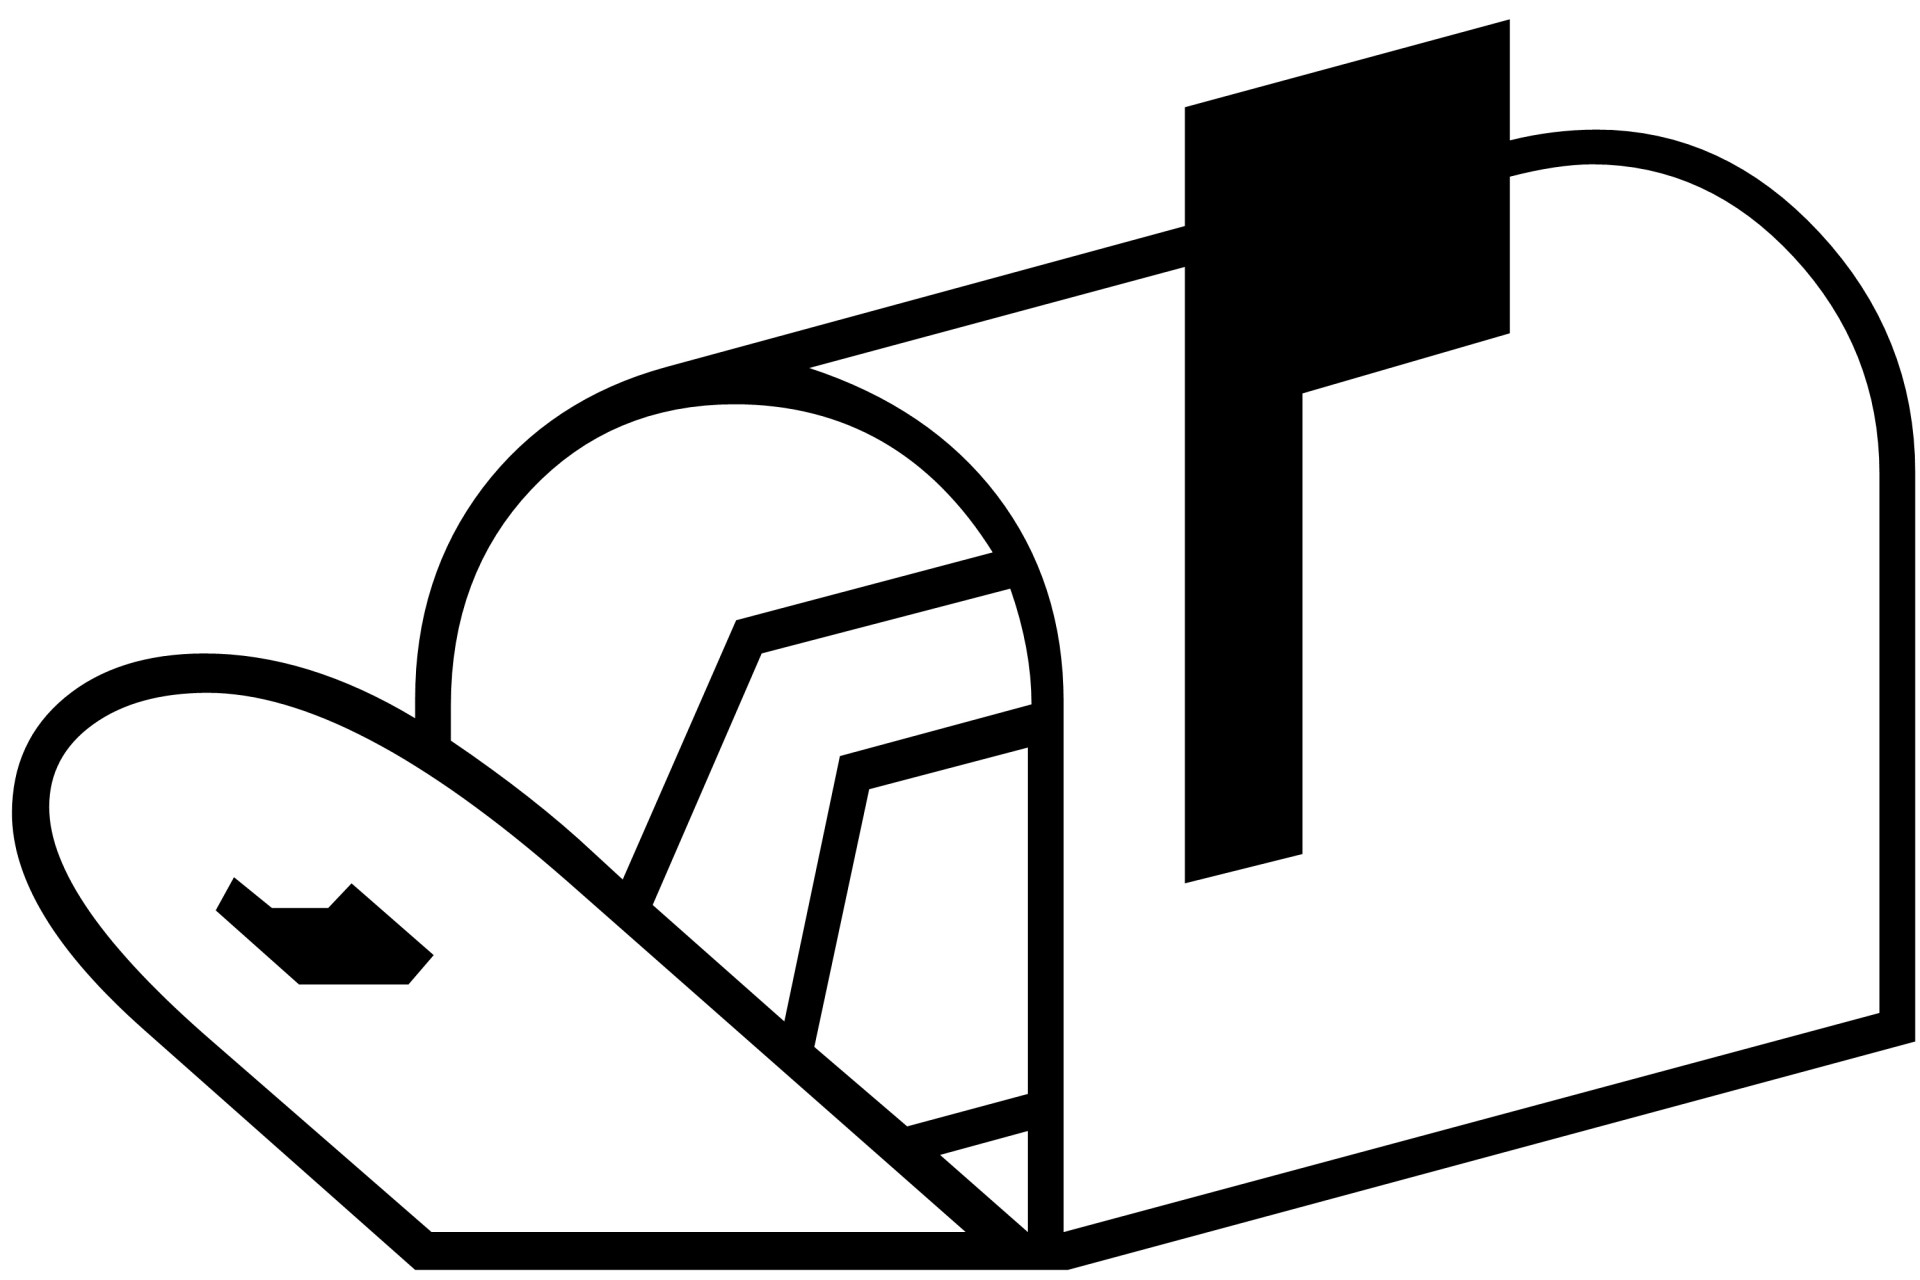 Open Mailbox Silhouette Free Stock Photo